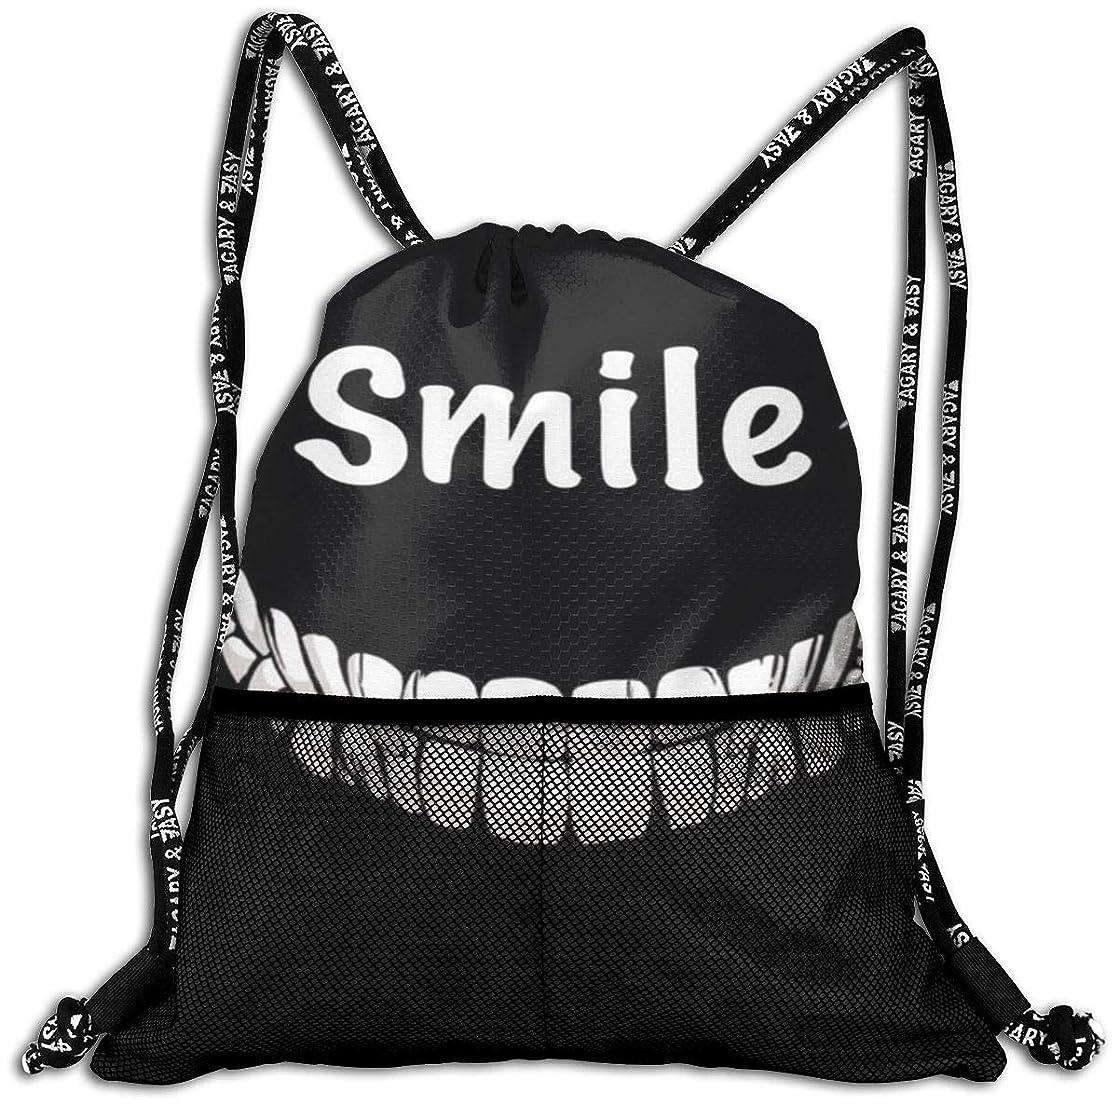 Girls & Boys Drawstring Backpack Theft Proof Lightweight Beam Bag, School Gymsack - Smile Face Teeth Black White Waterproof Backpack Soccer Basketball Bag qilxqhzk33203